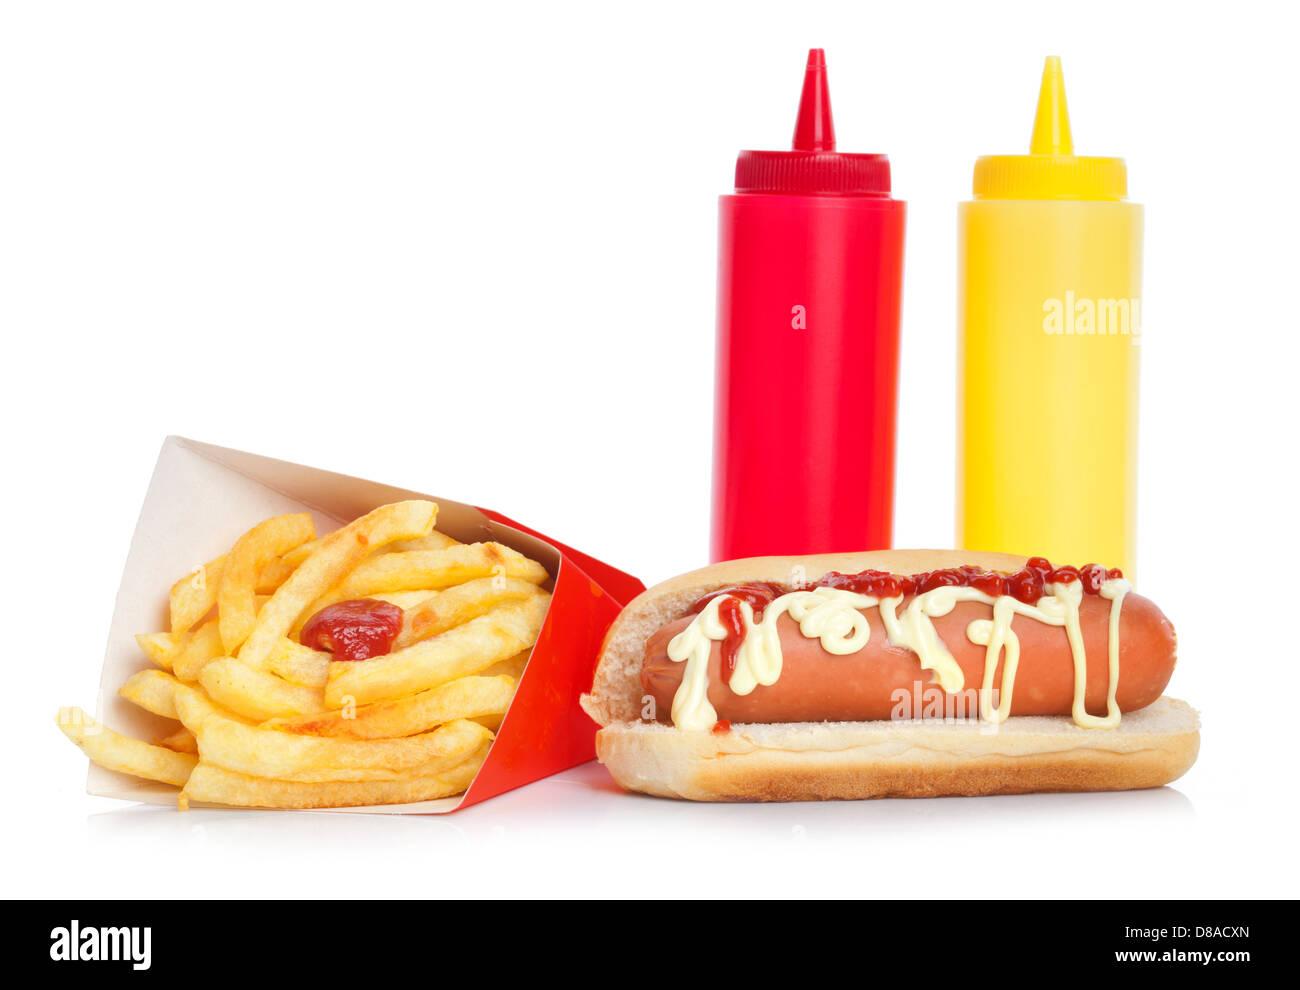 Fresh and tasty hot dog with fried potatoes on white - Stock Image